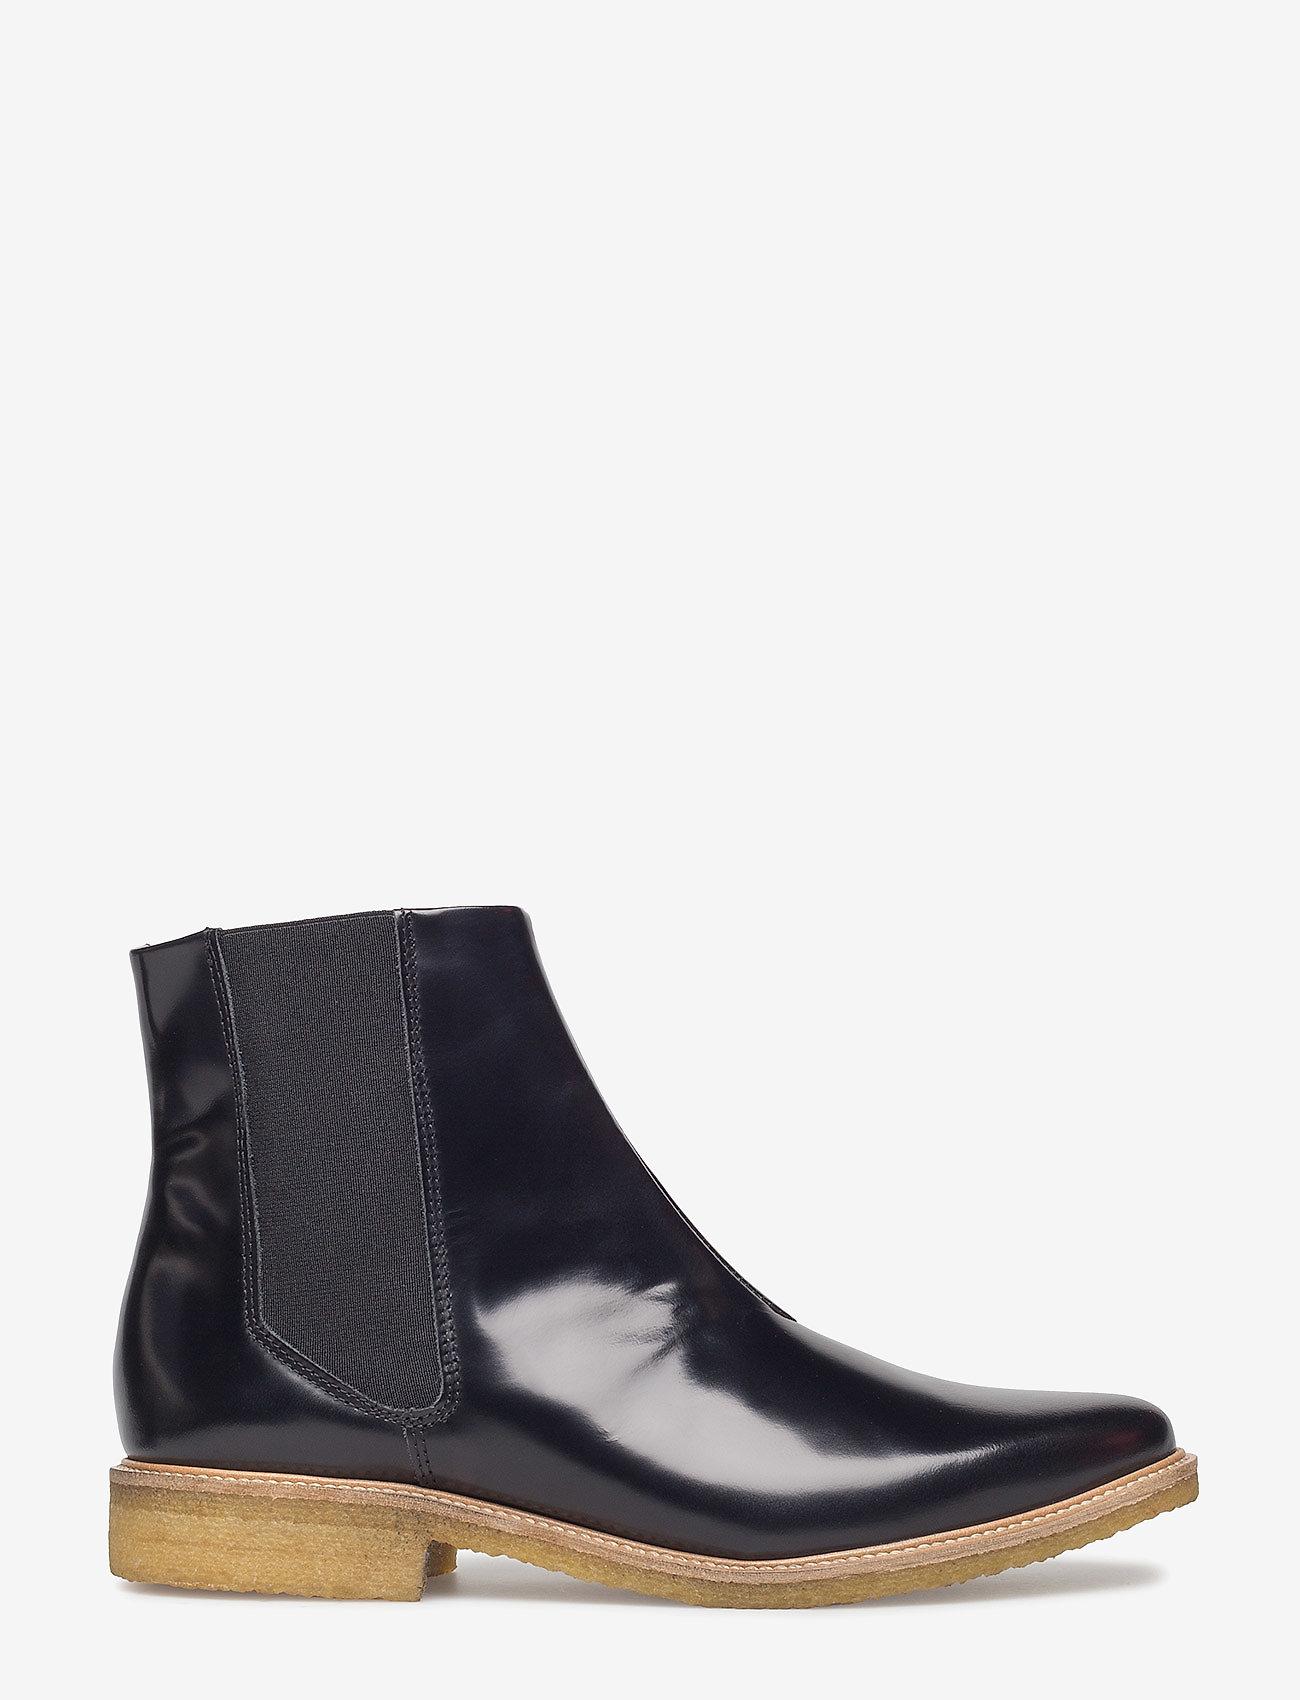 Royal Republiq Prime Crepe Chelsea - Boots